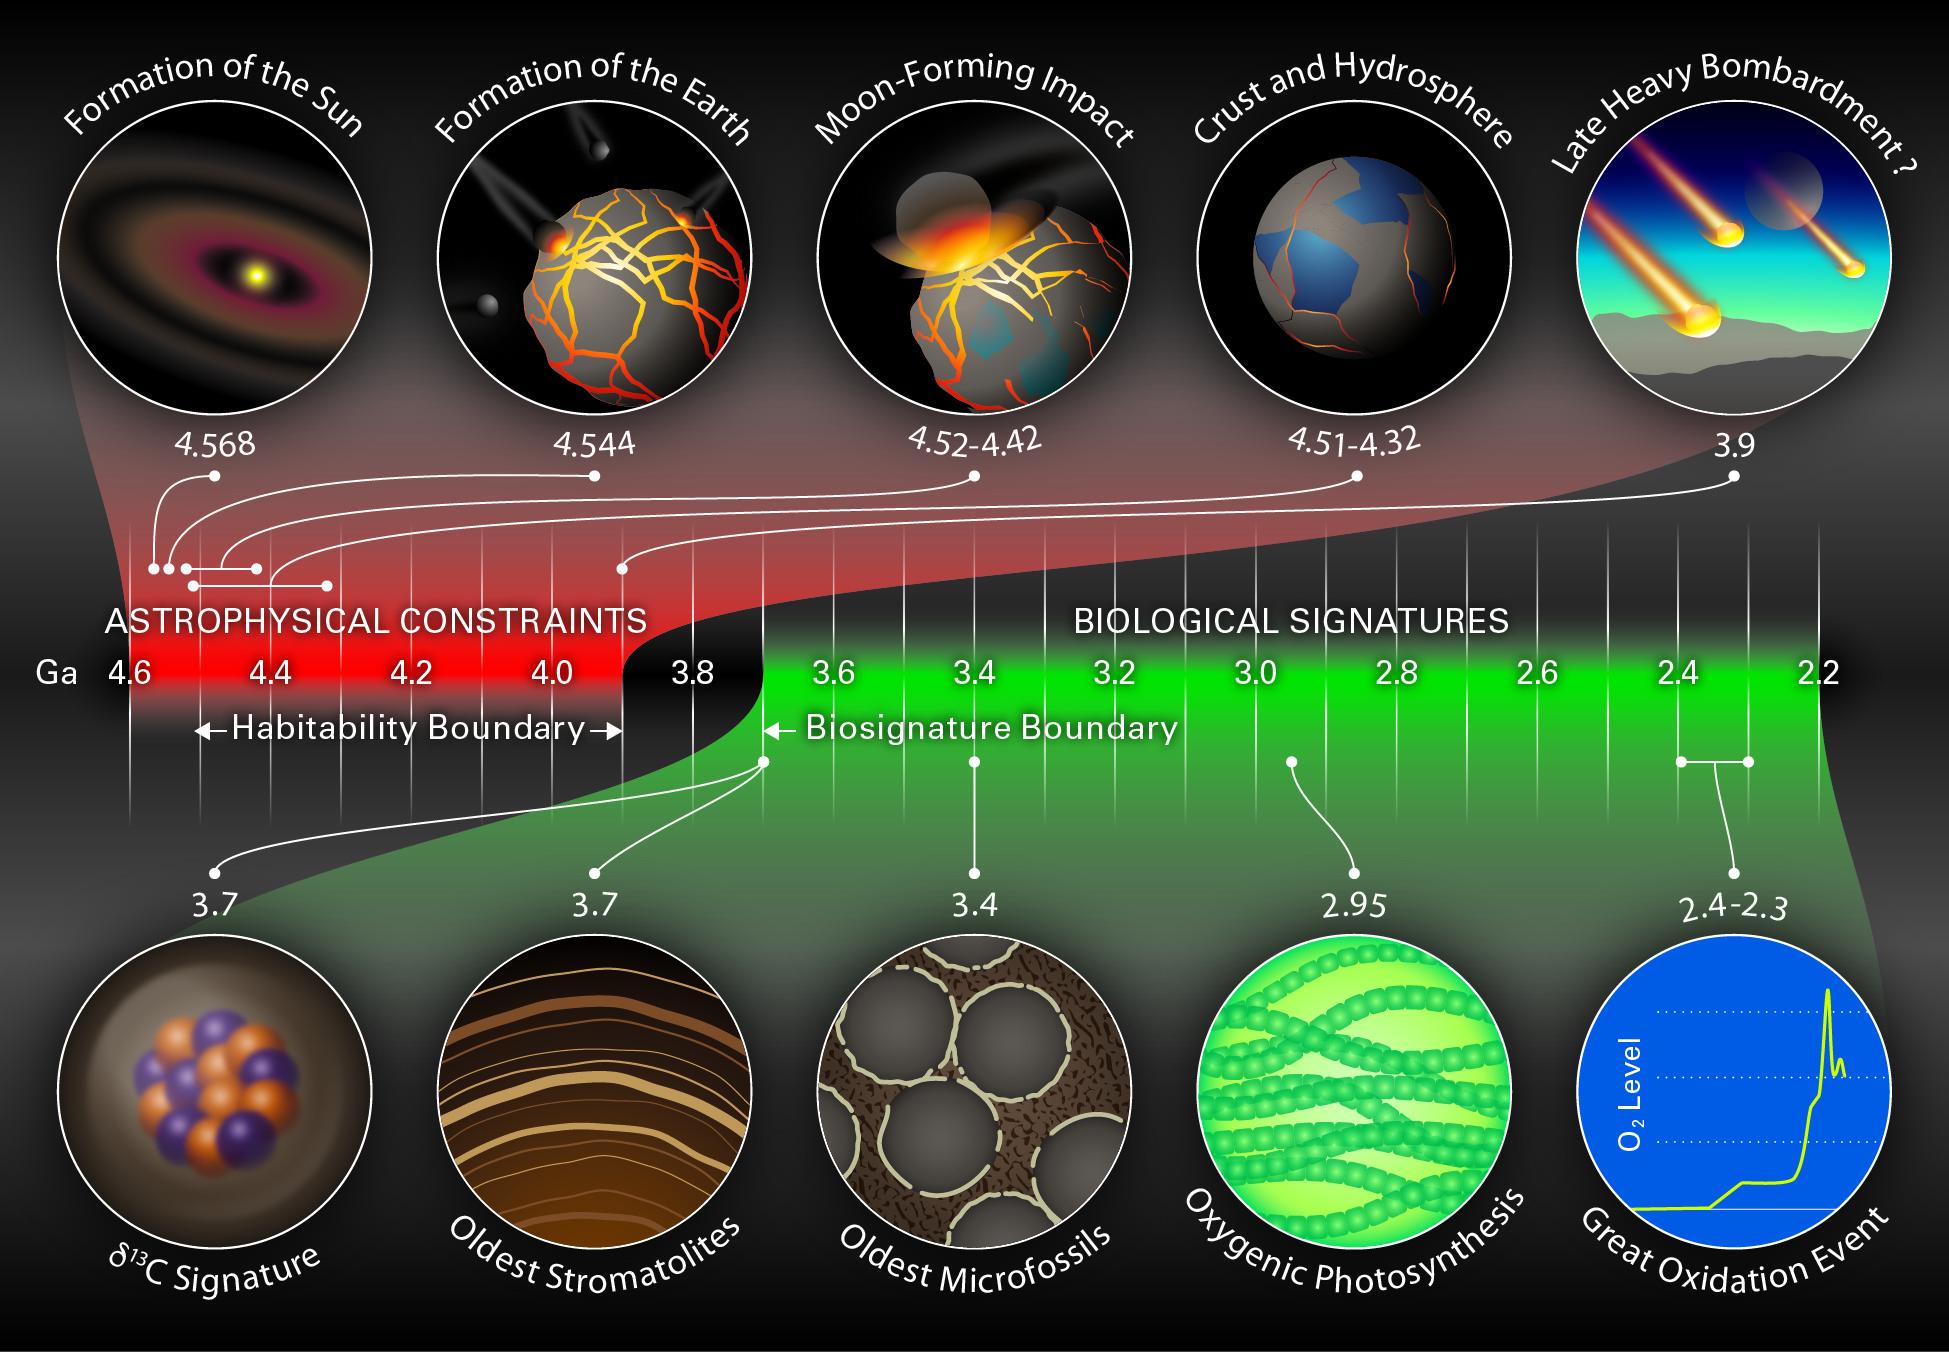 Origin_of_Life_Timeline_FINAL.jpg